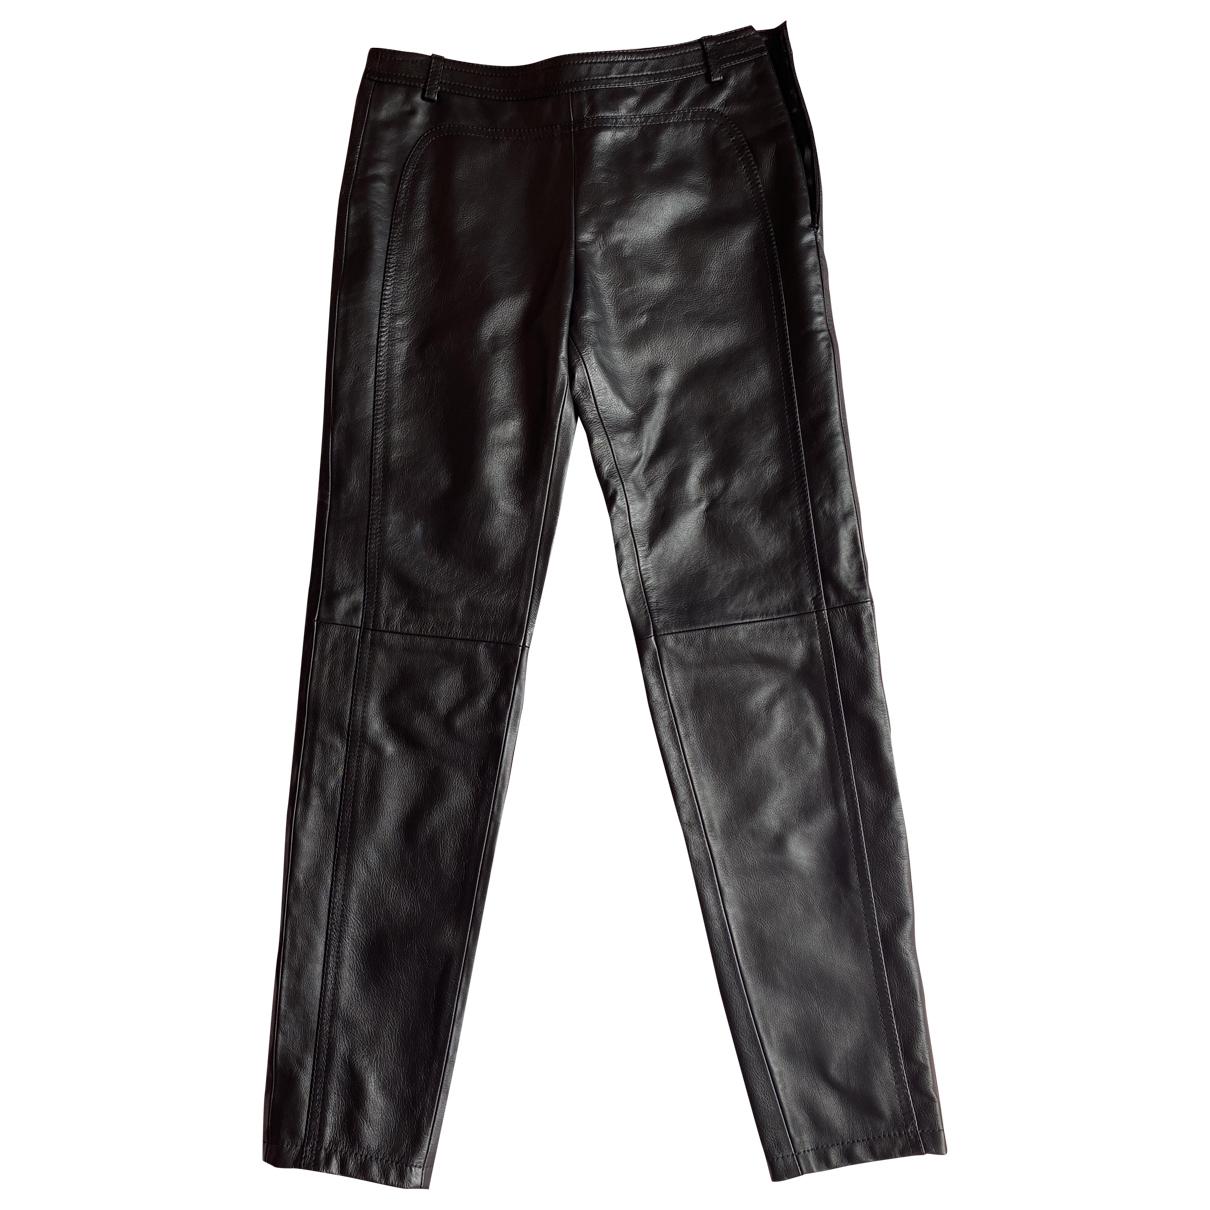 Giambattista Valli \N Black Leather Trousers for Women XS International